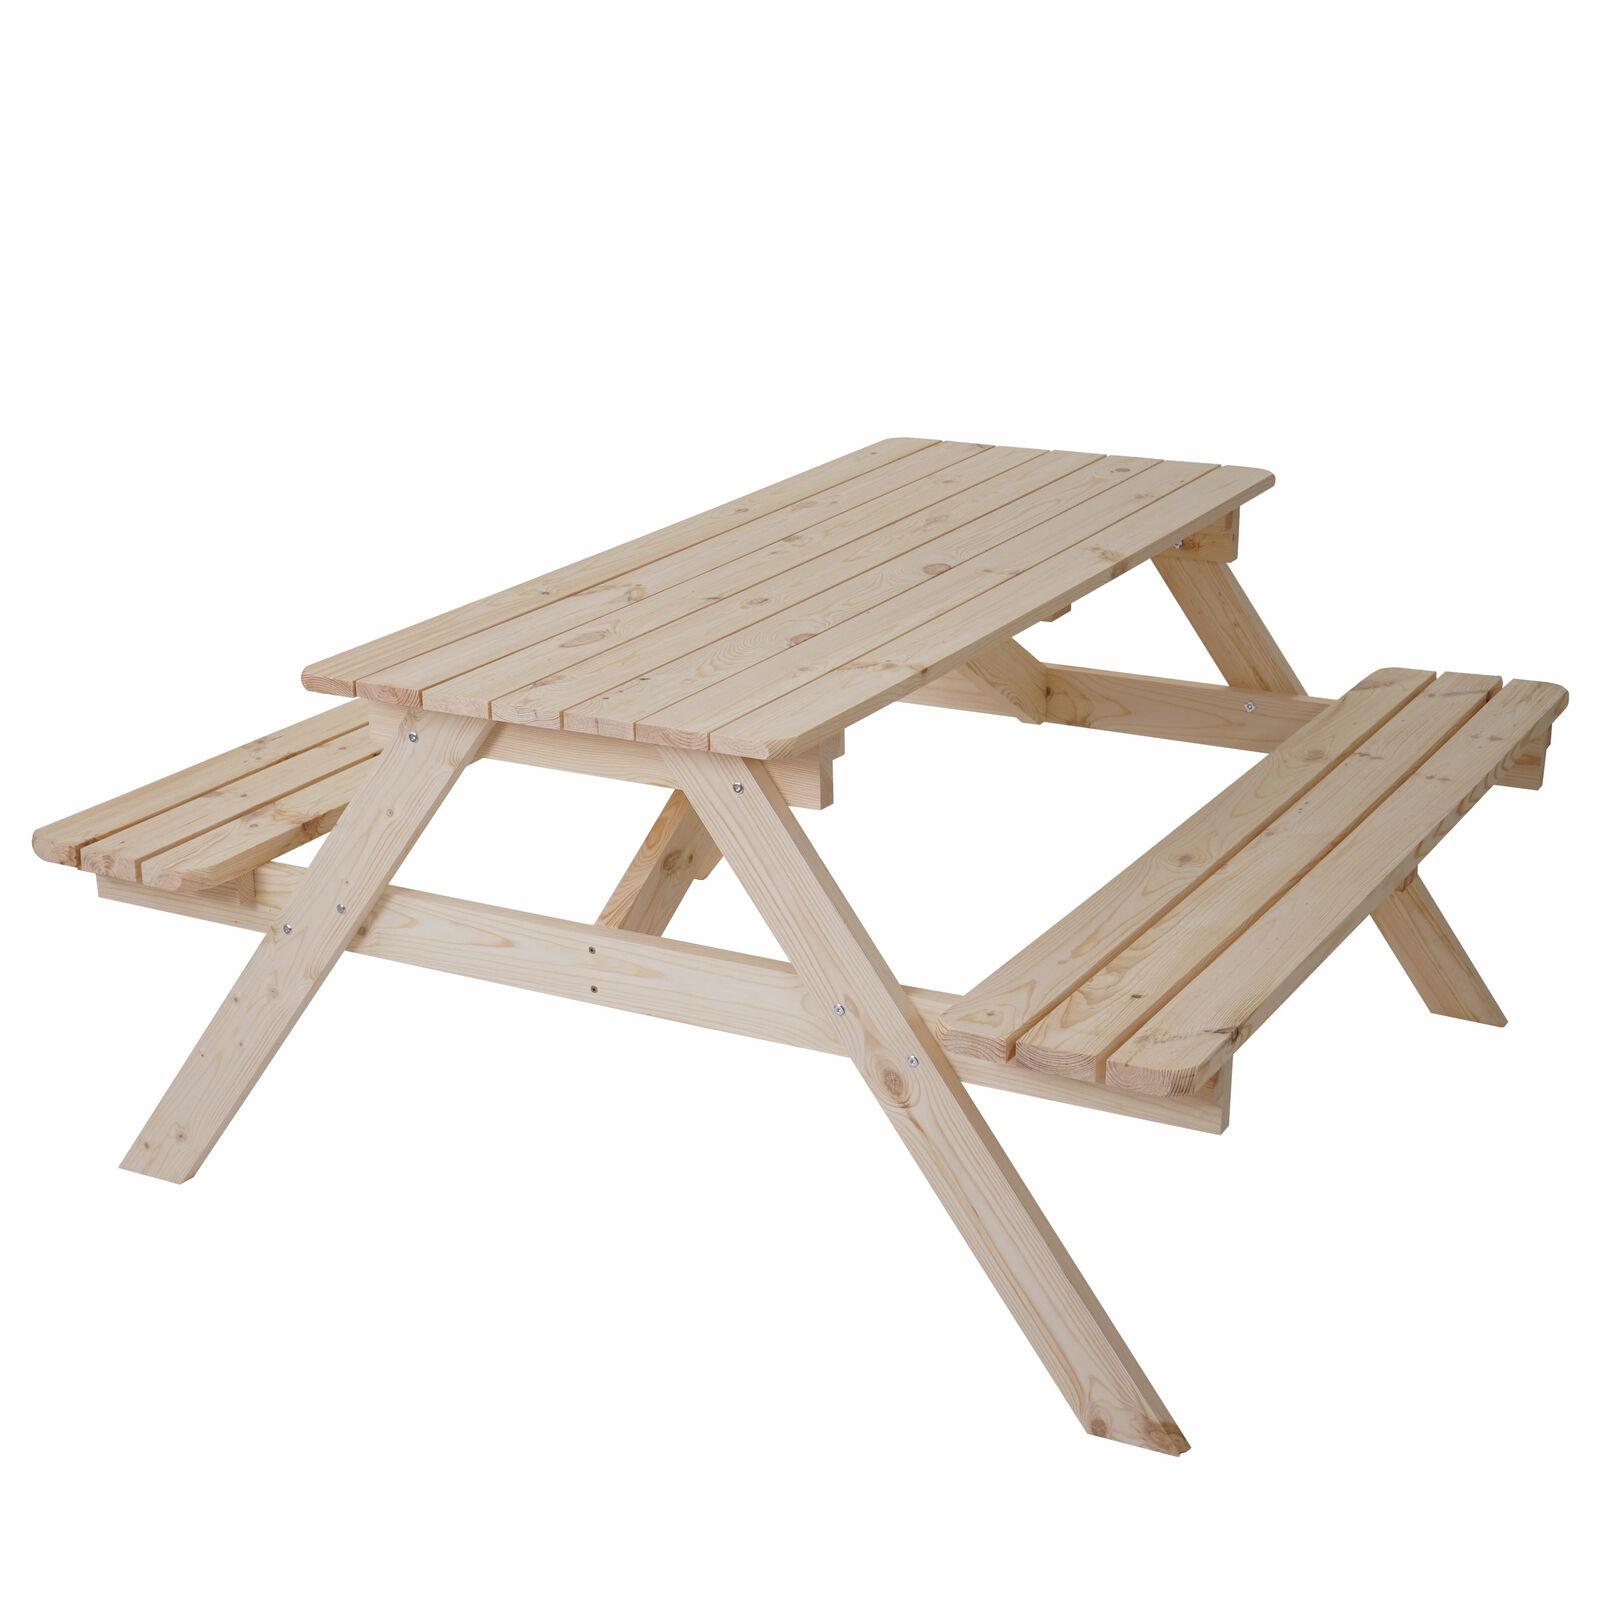 BIRRA Giardino-Set da Bergamo, Picnic-Set, legno gastroqualität massiccio 148x150cm